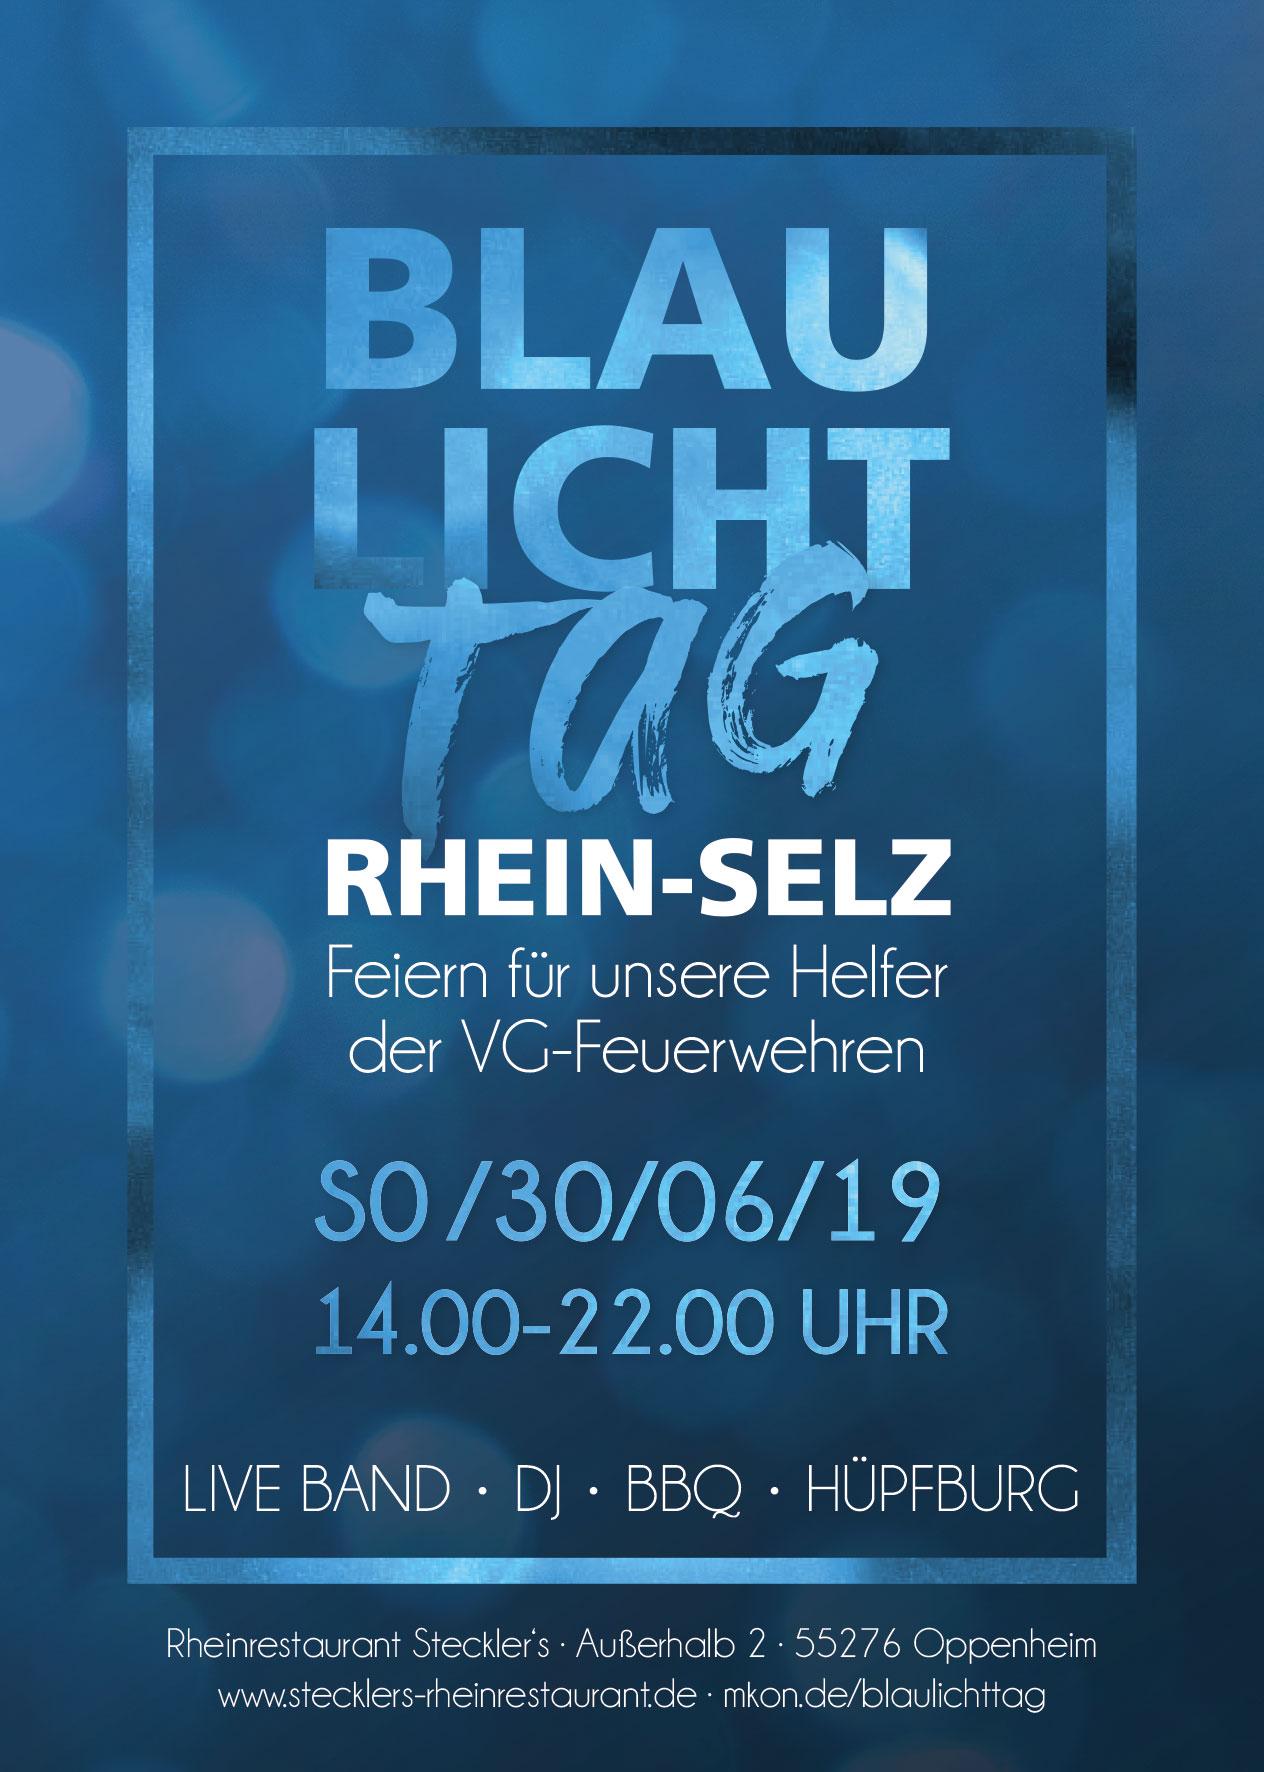 Plakat Blaulichttag